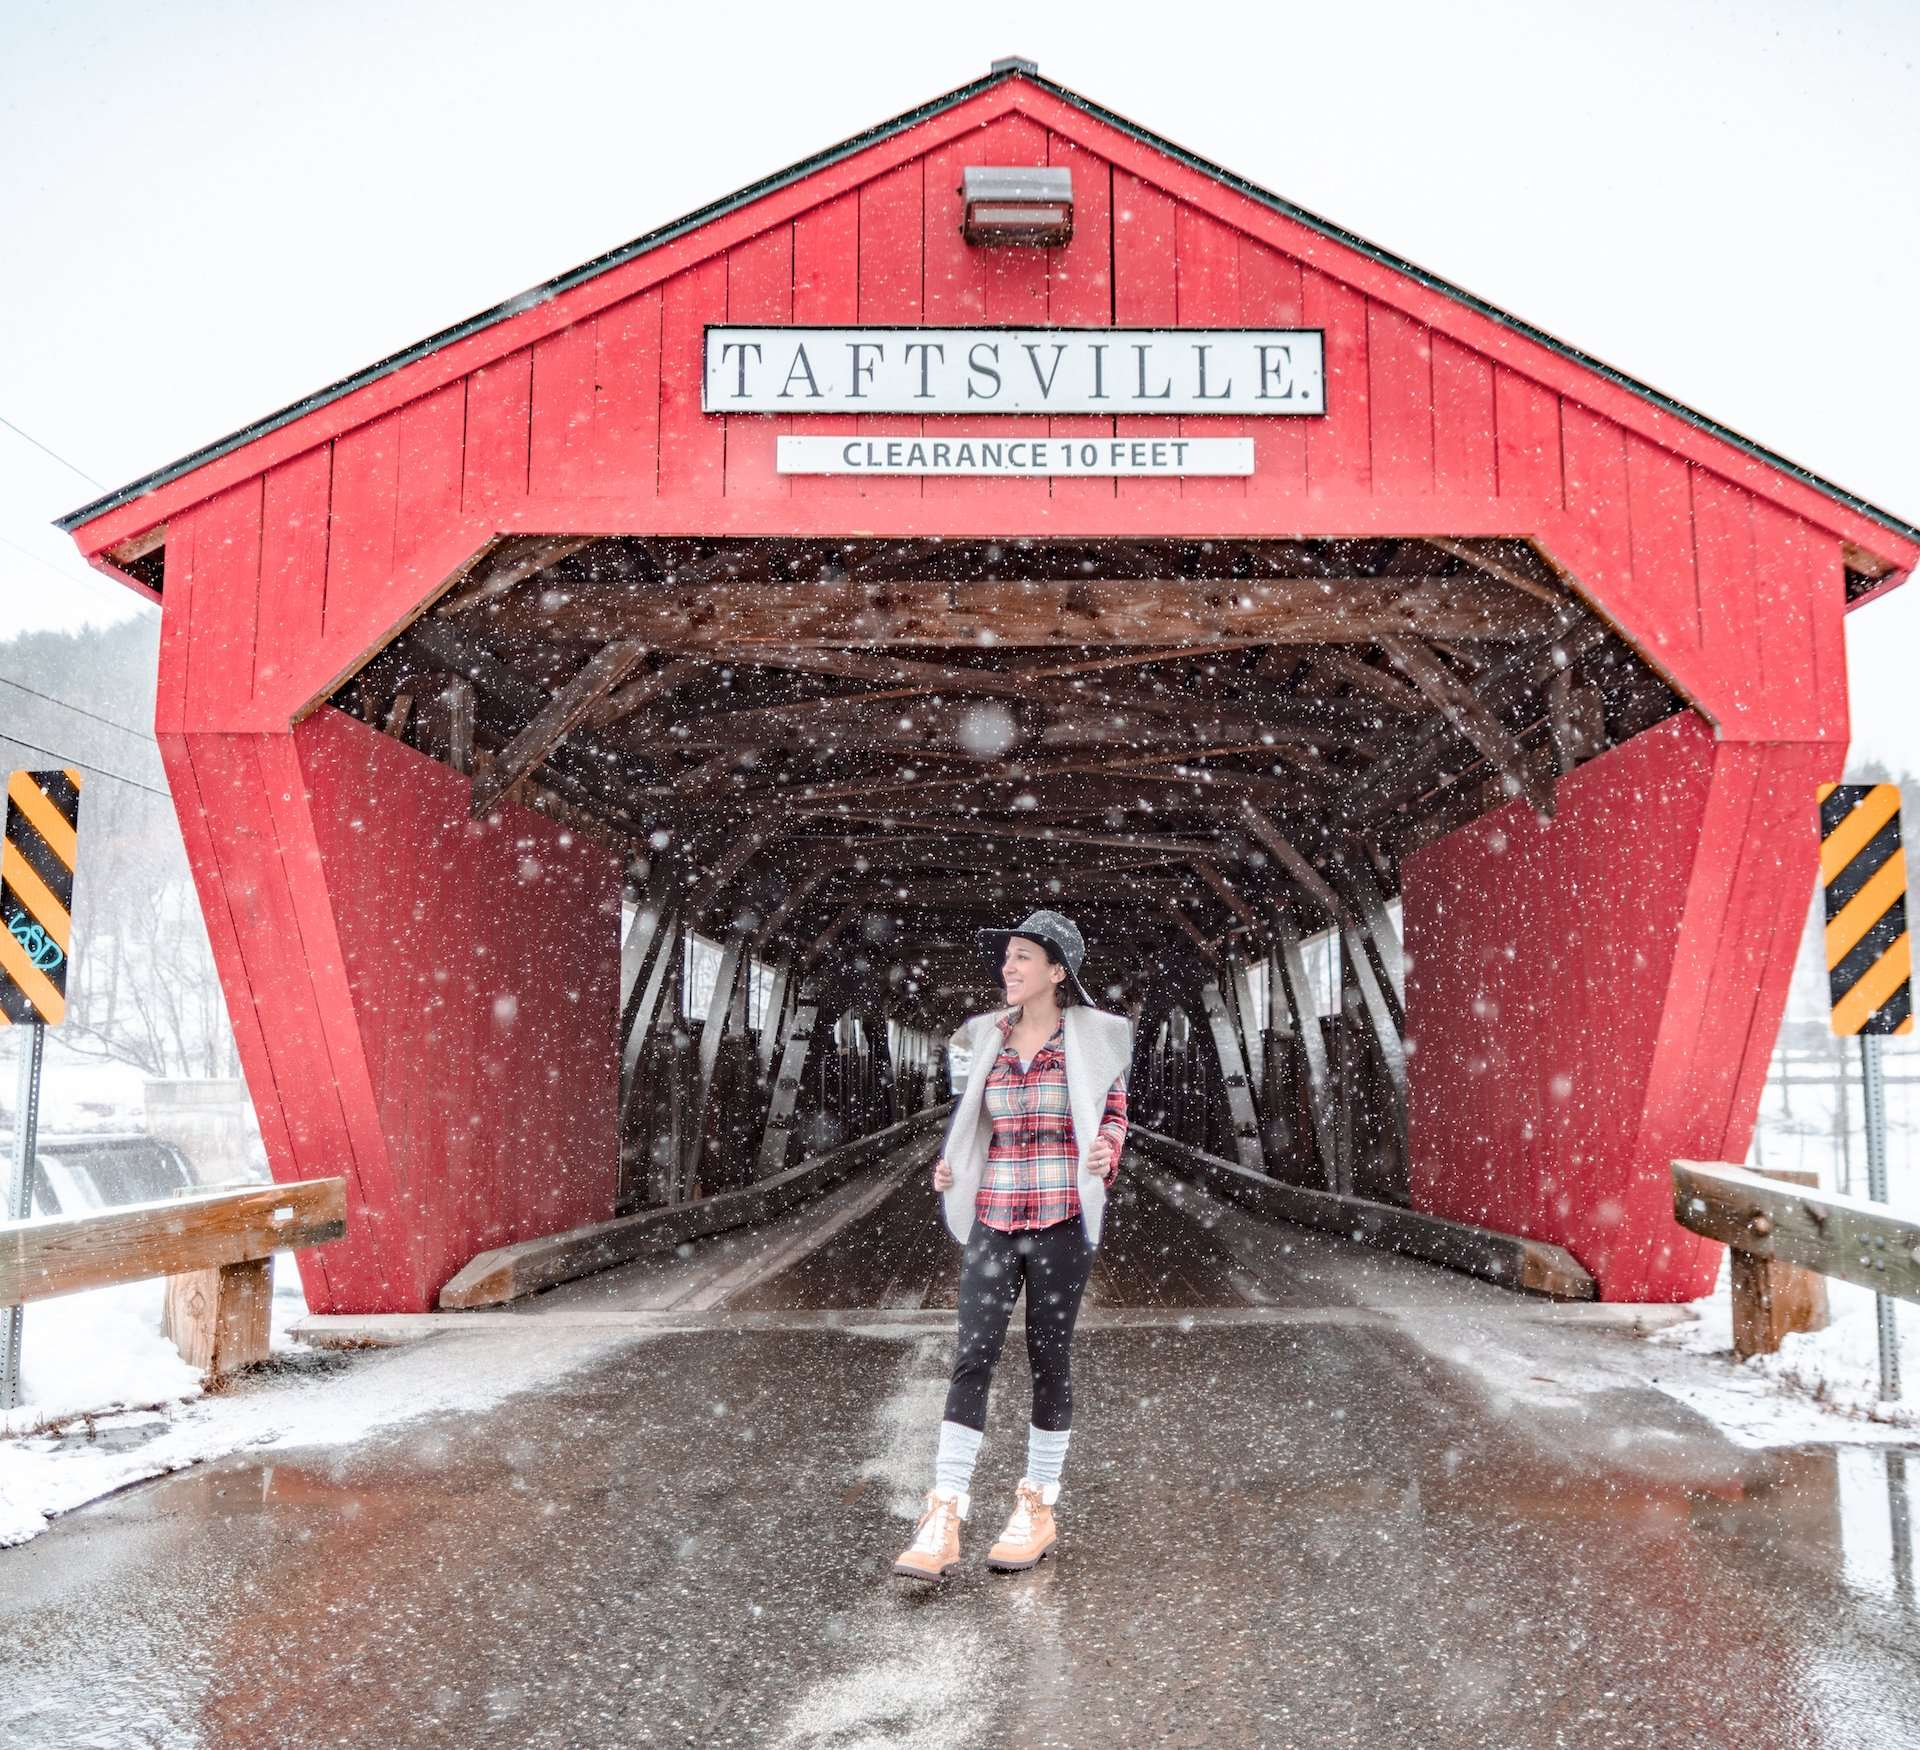 Taftsville Covered Bridge in Woodstock